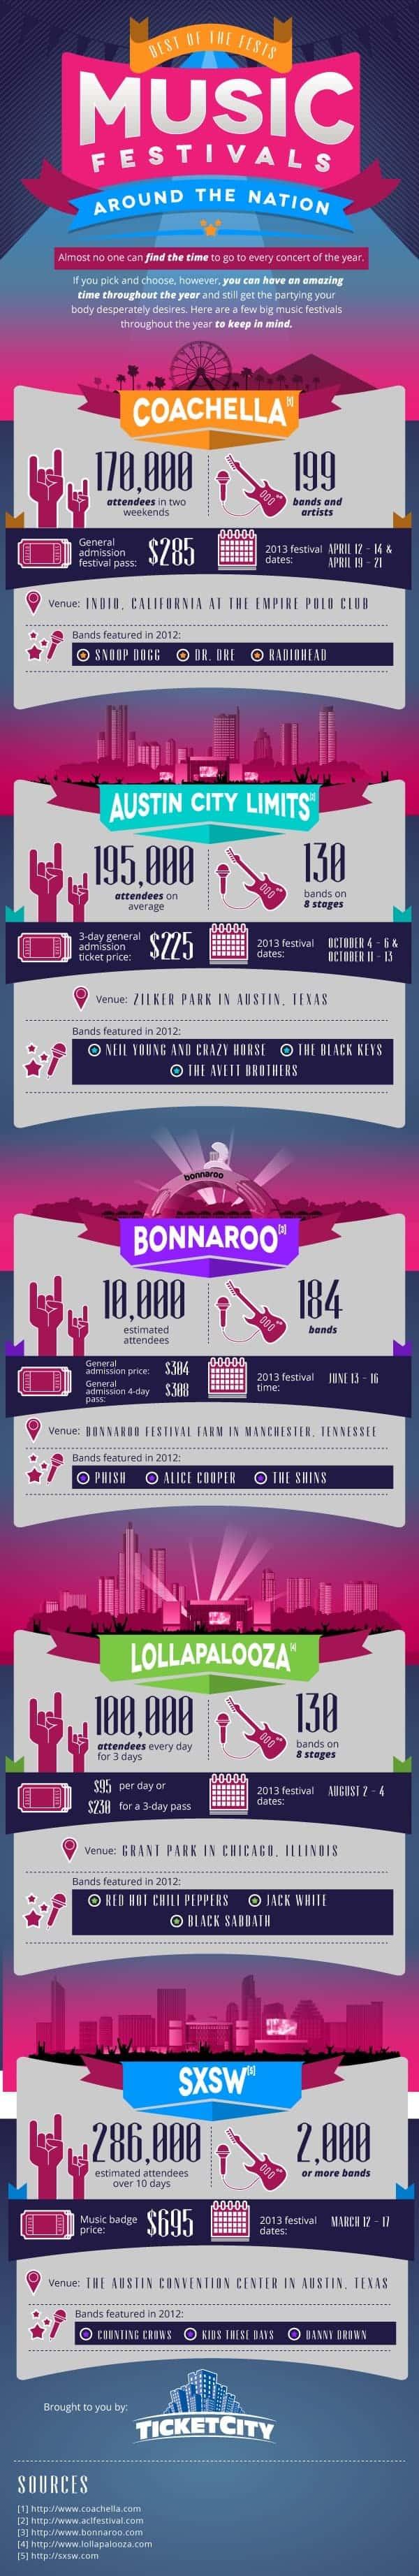 Music Festivals Around The Nation